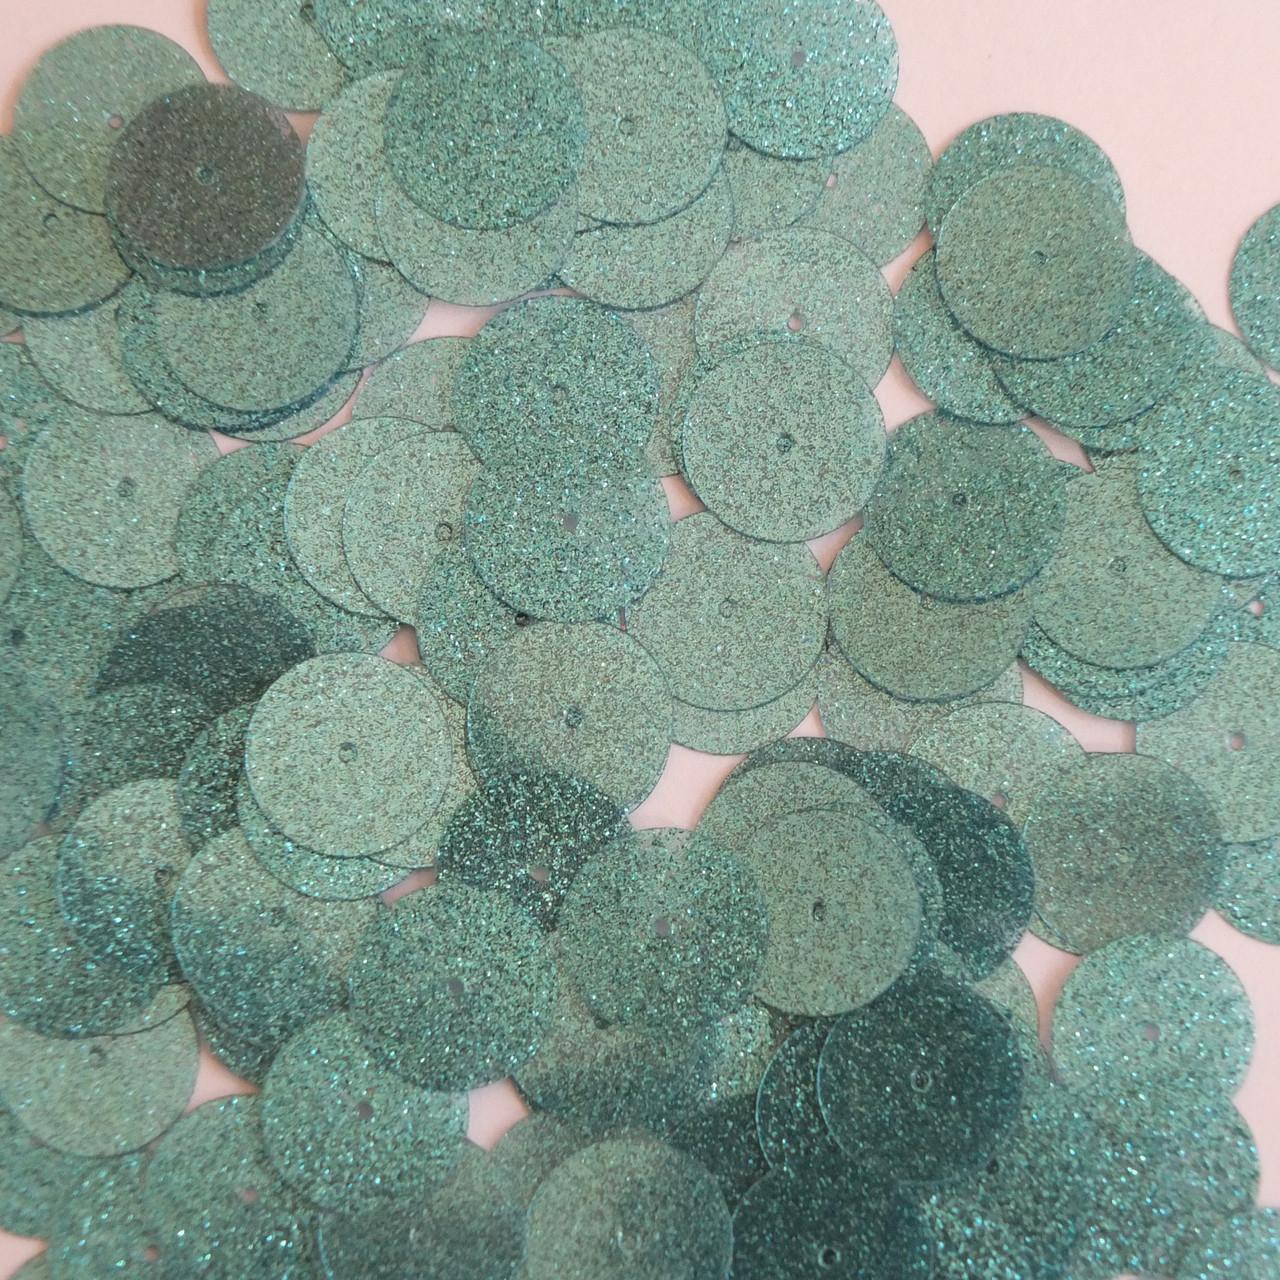 Round Sequin 15mm Royal Blue Metallic Sparkle Glitter Texture Couture Paillettes